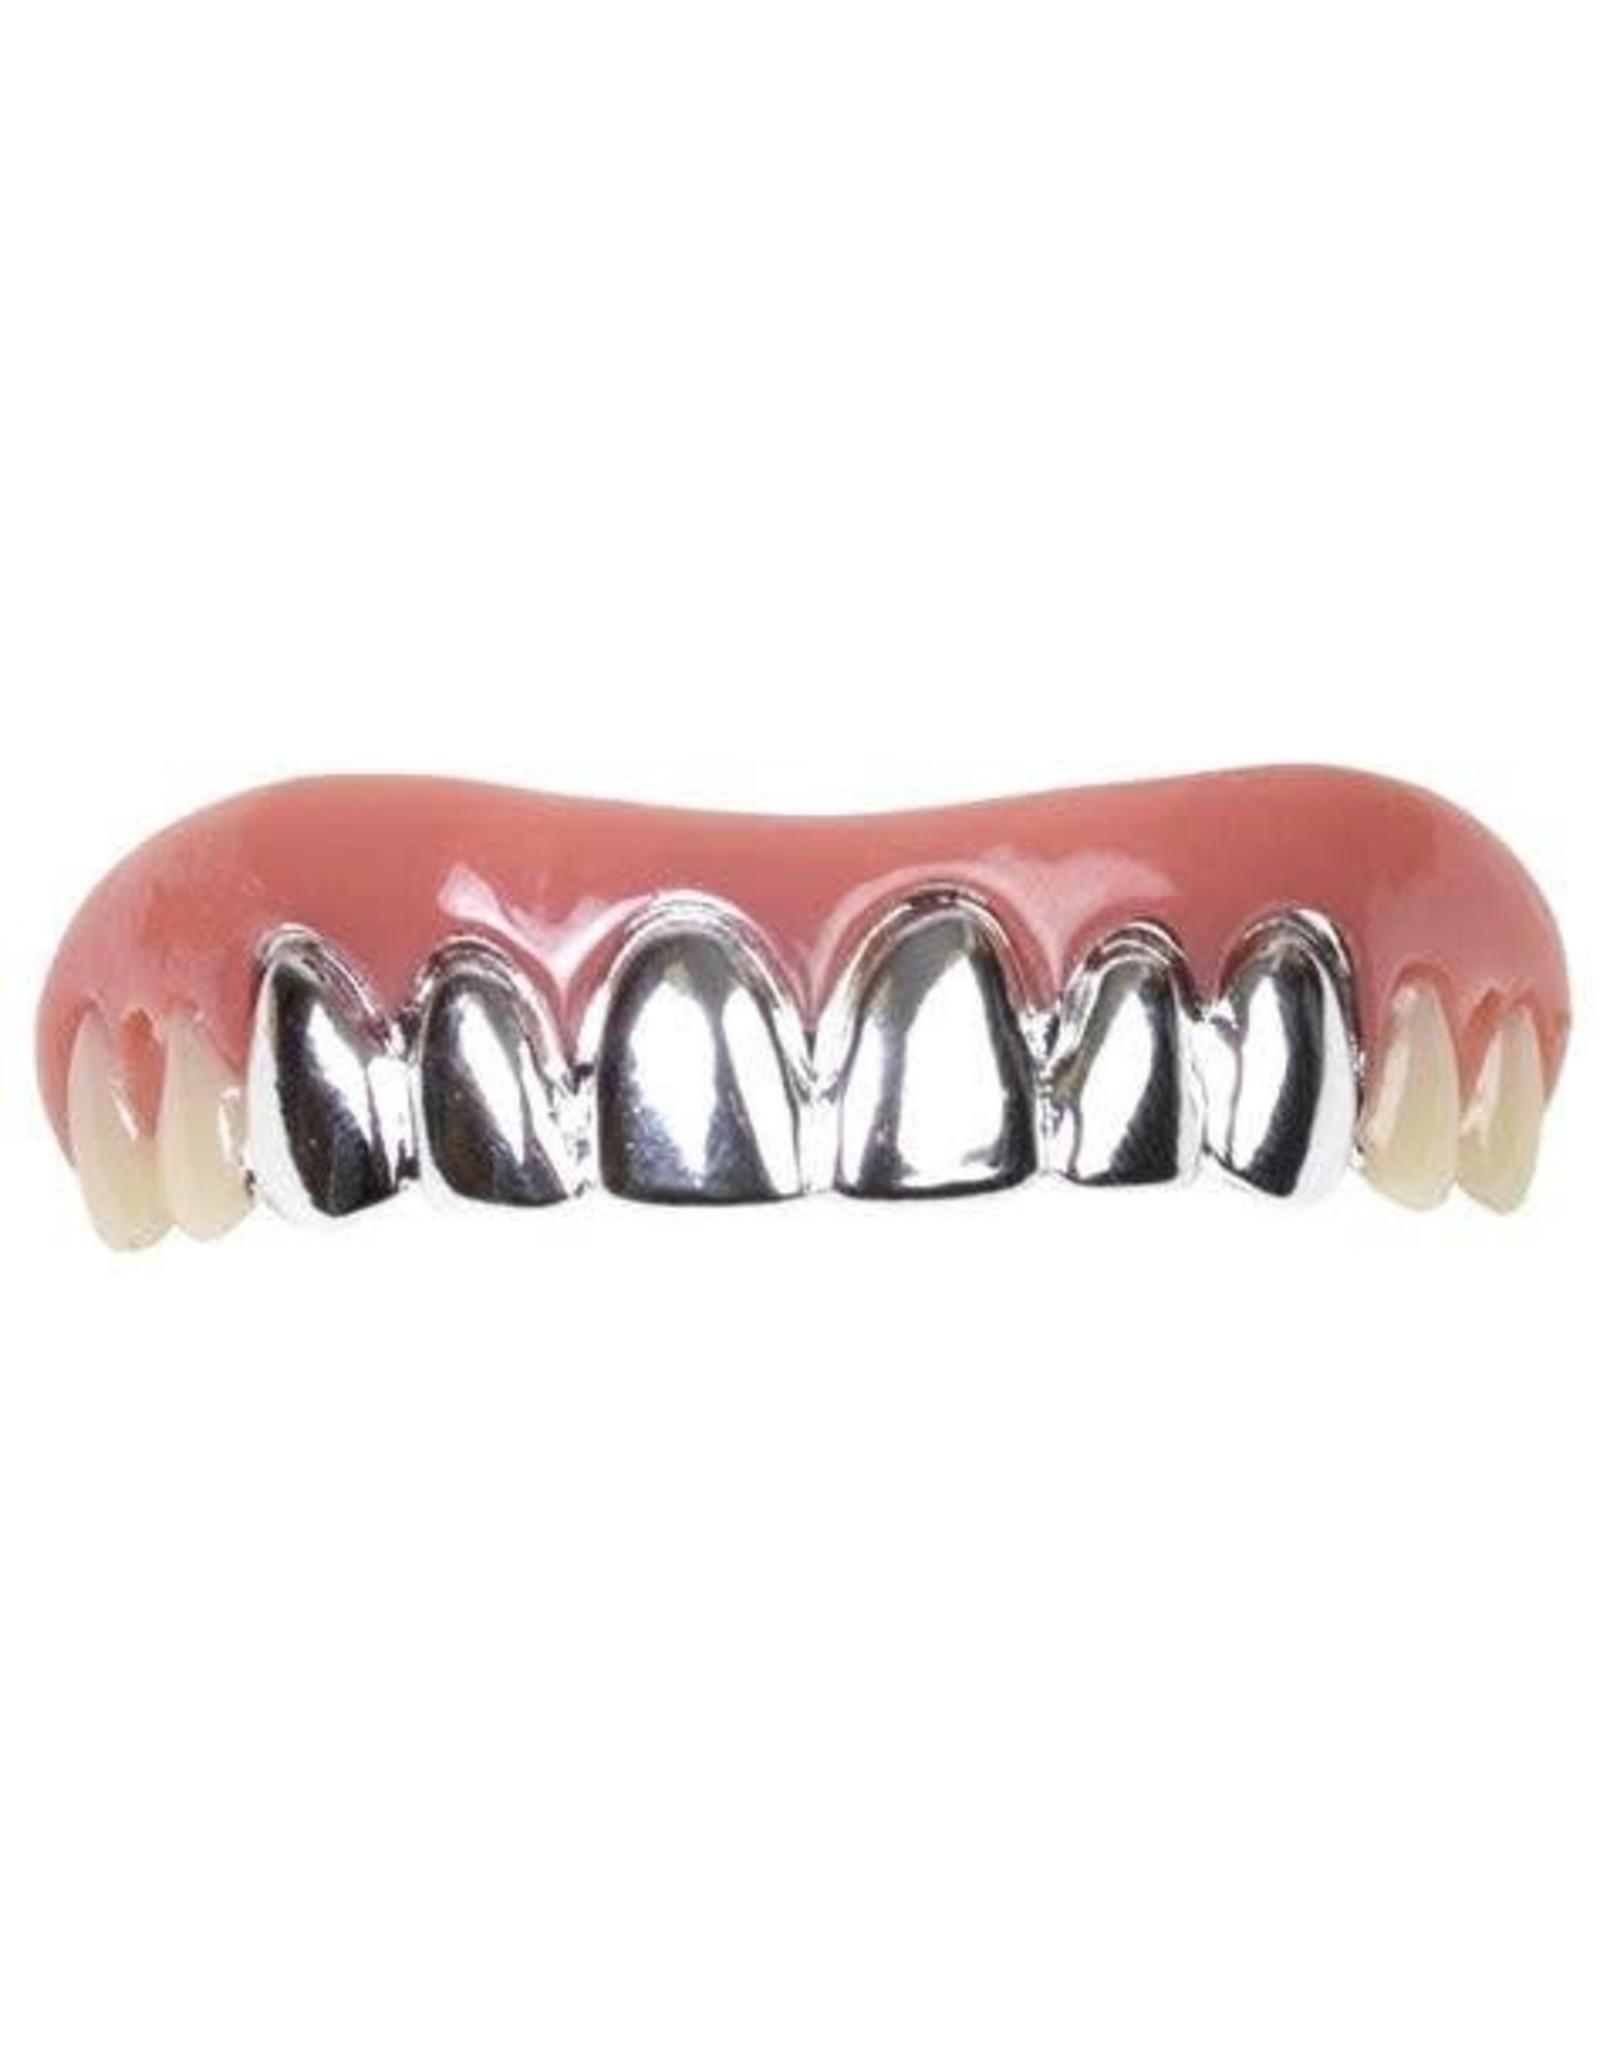 Billy Bob Billy Bob Platinum Teeth